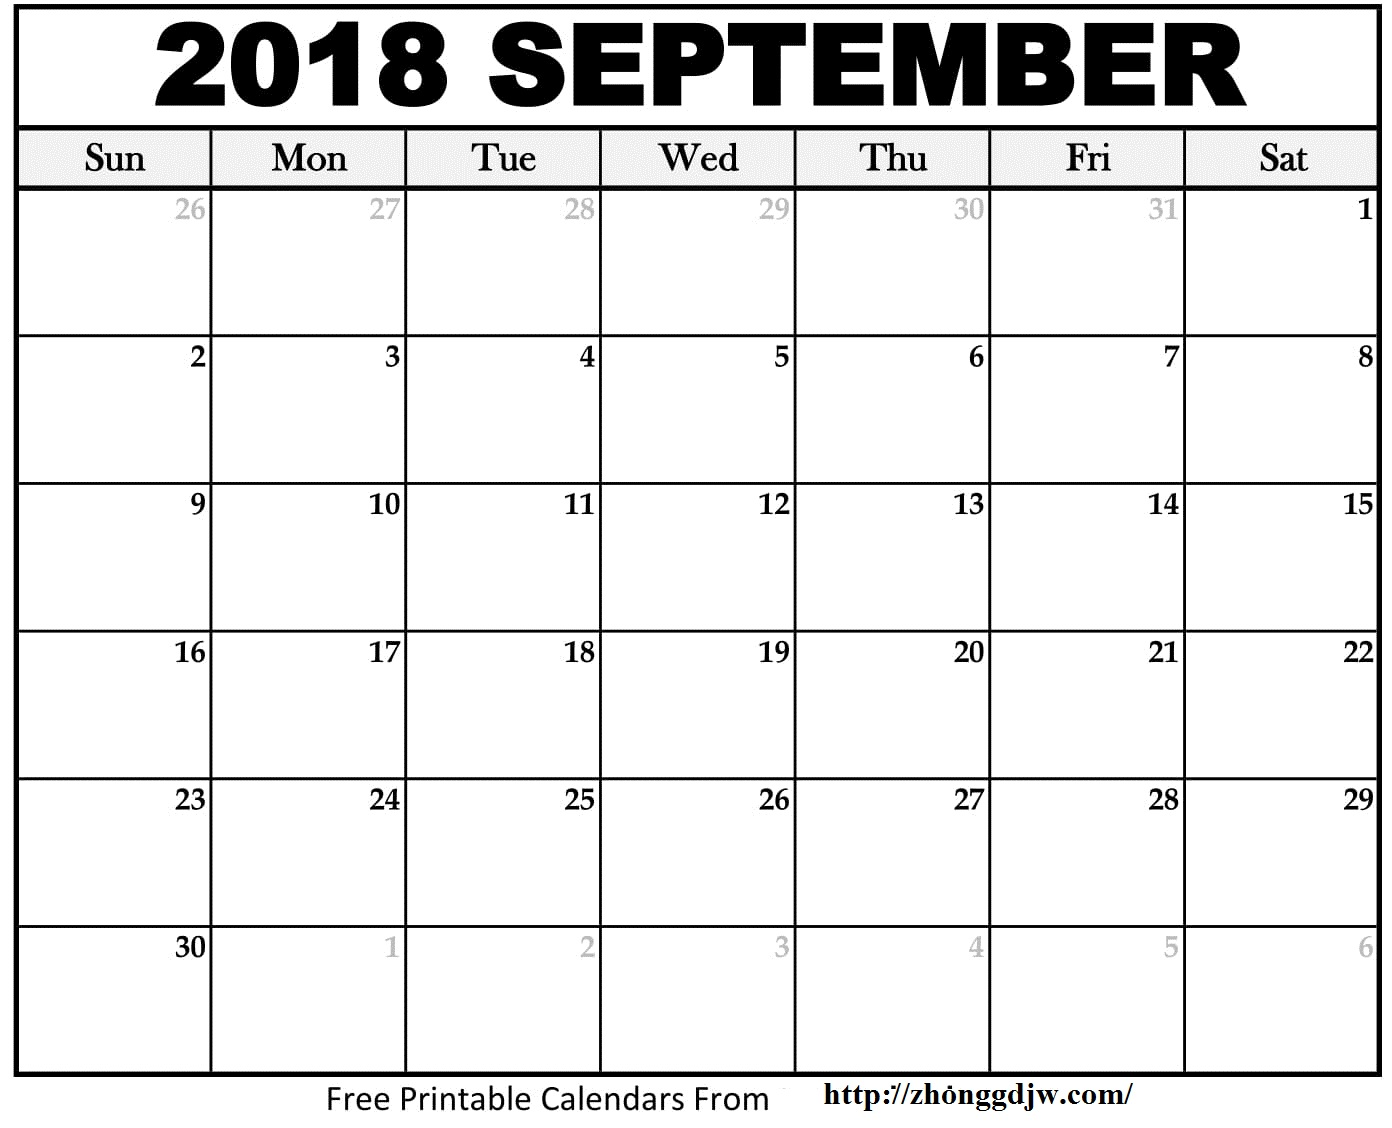 September Calendar 2018